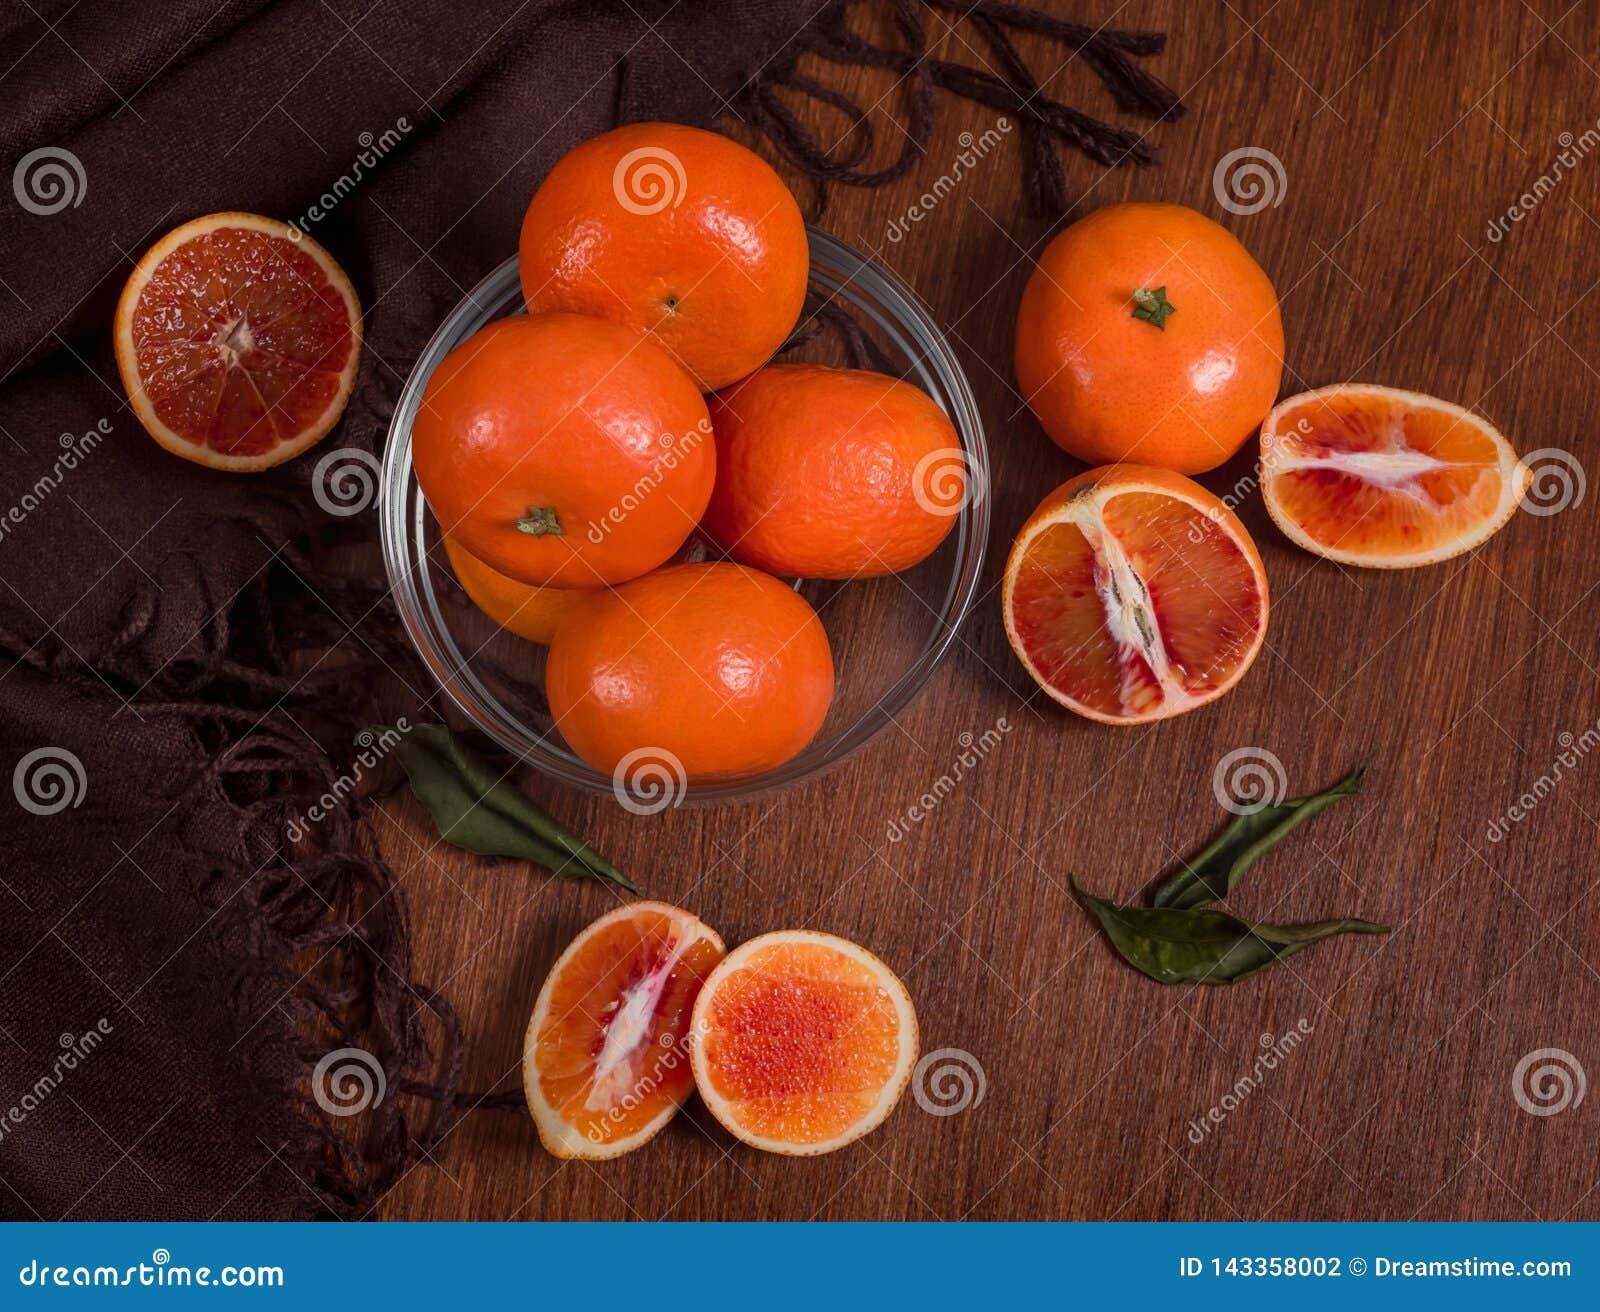 Stilleven van sinaasappelen Close-up